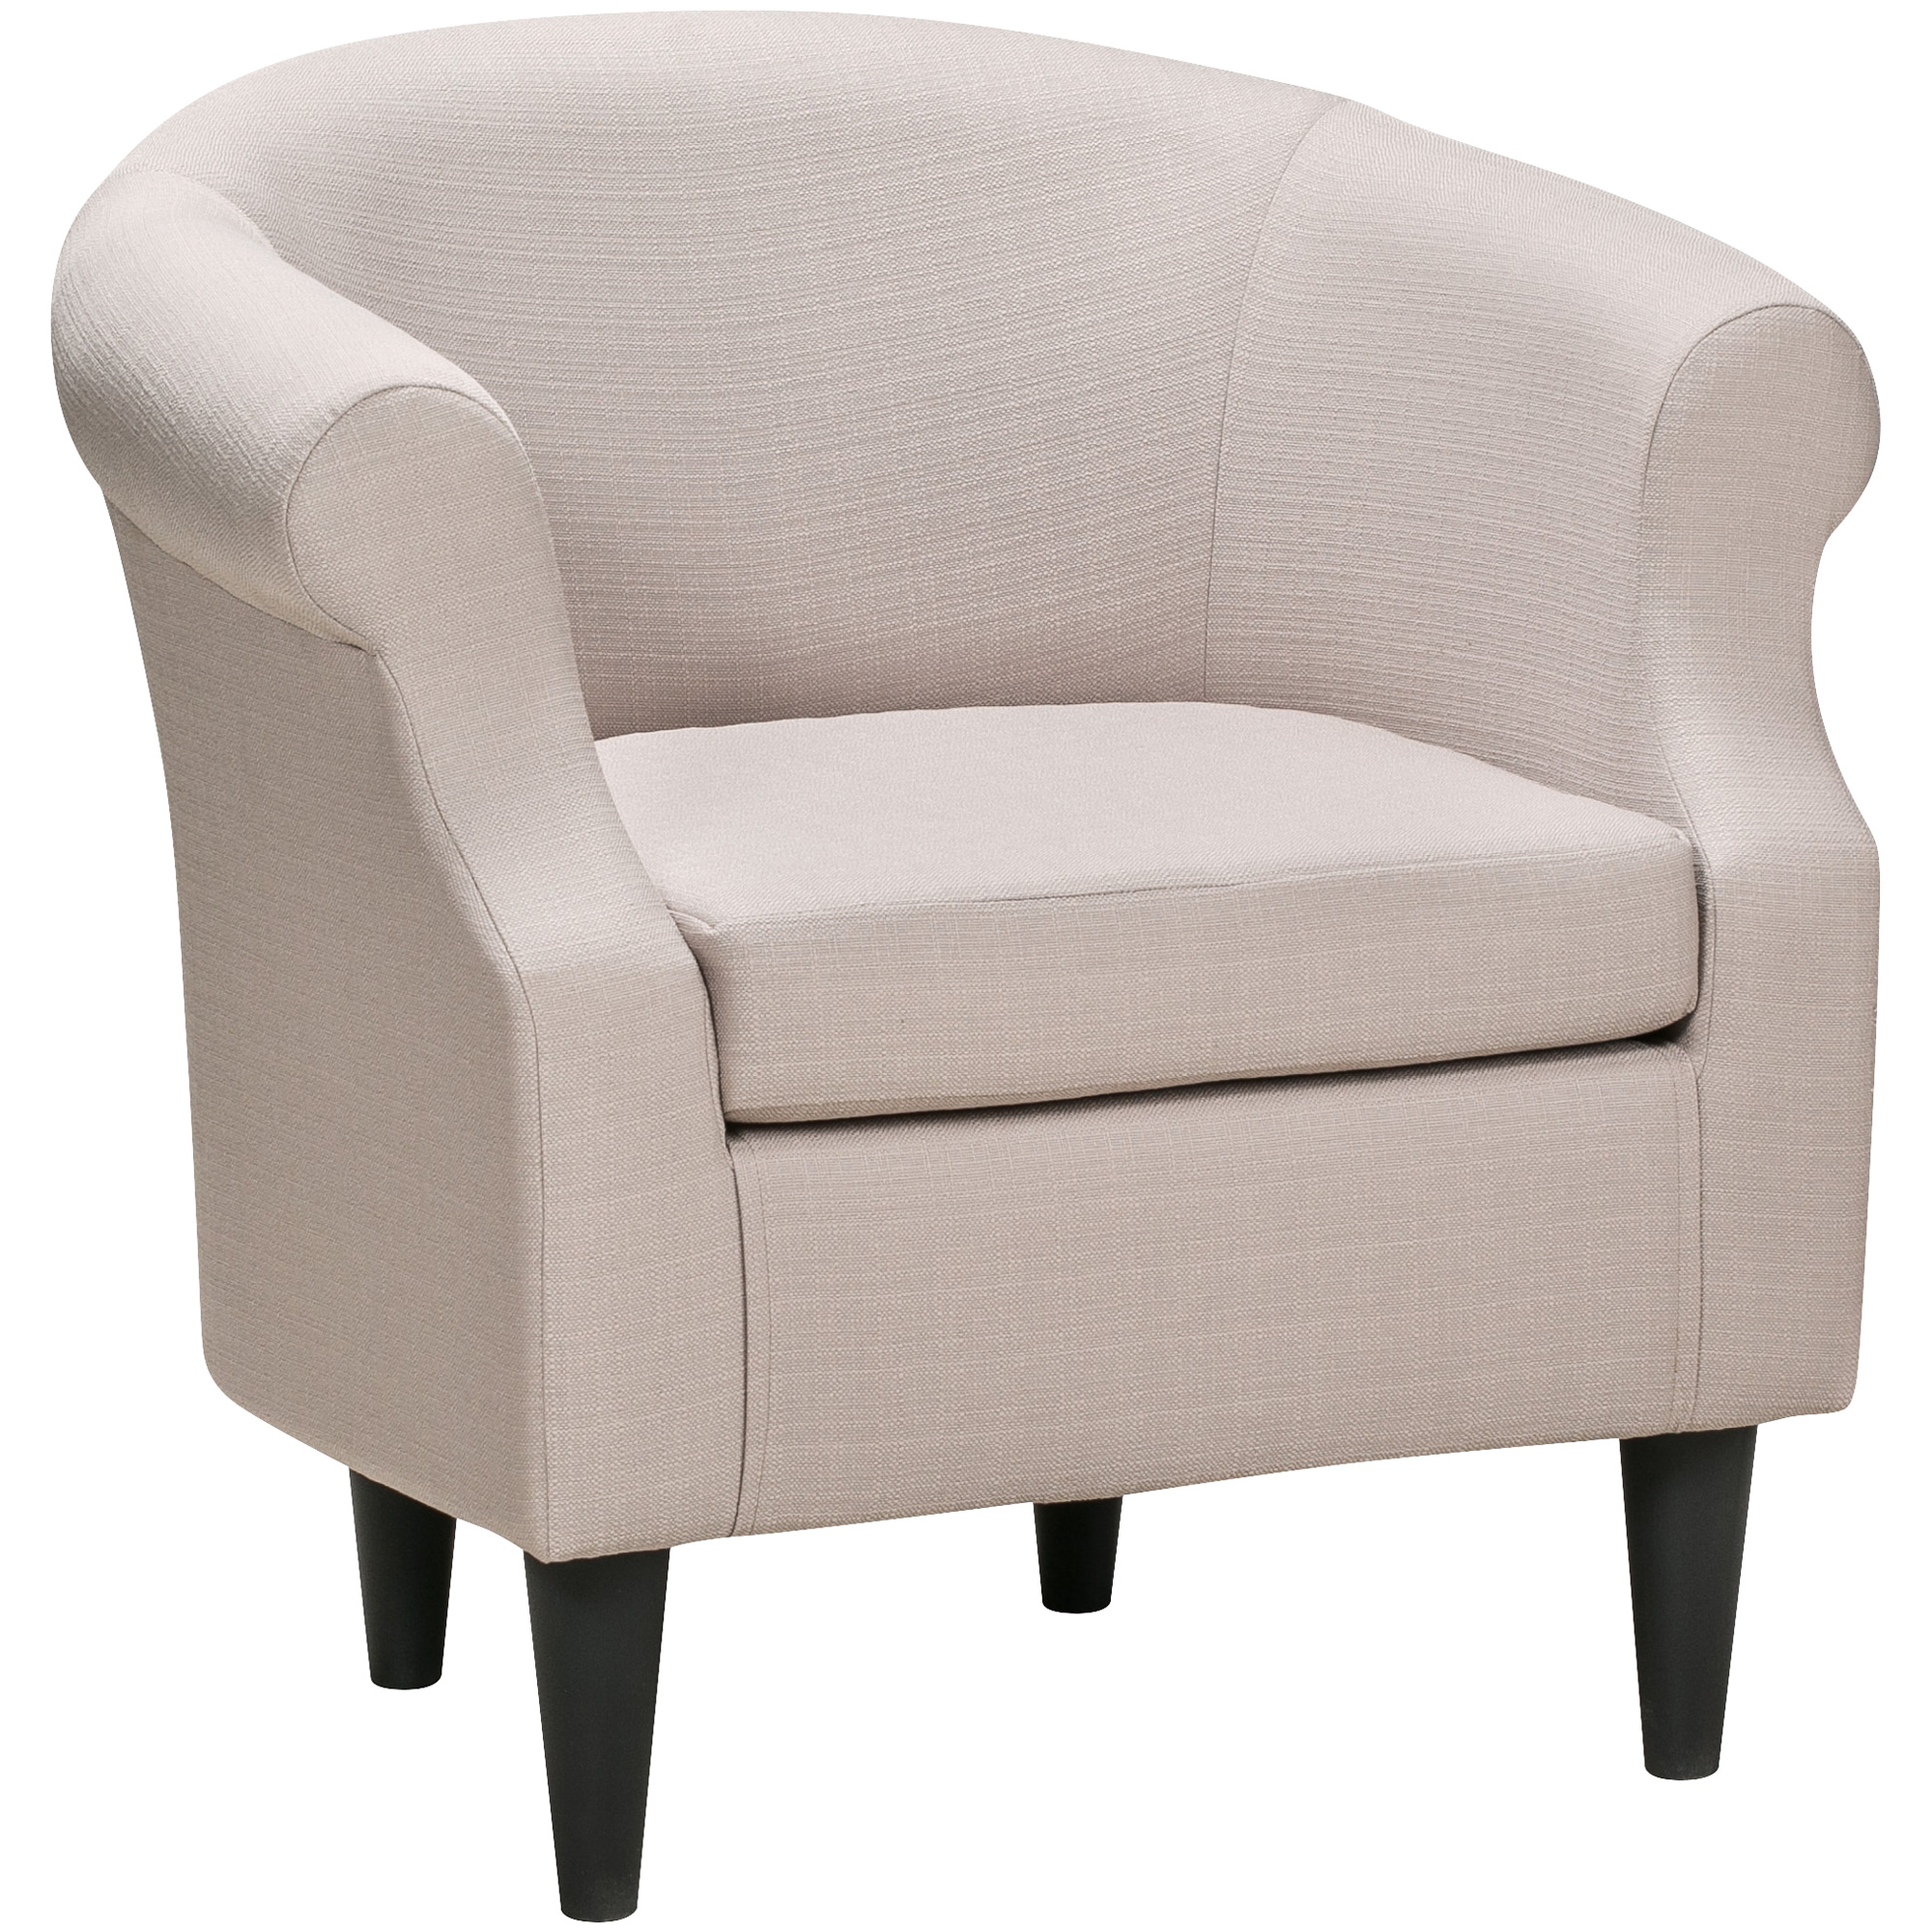 Overman | Nikole Mouse Accent Chair